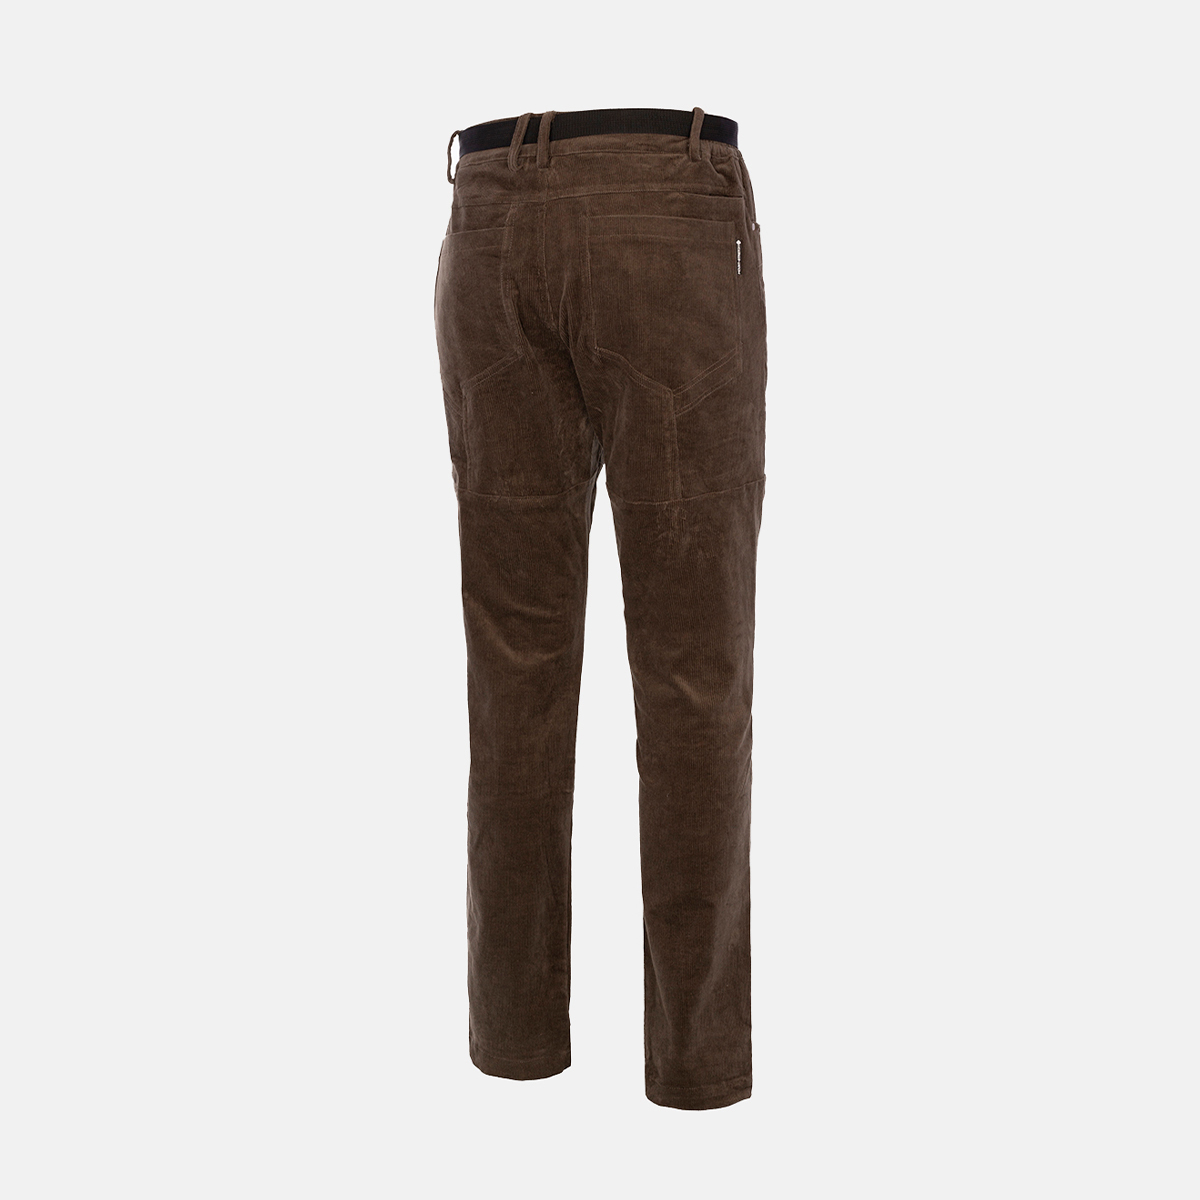 MAN'S NESS STRETCH PANT (CORDUROY) GREEN